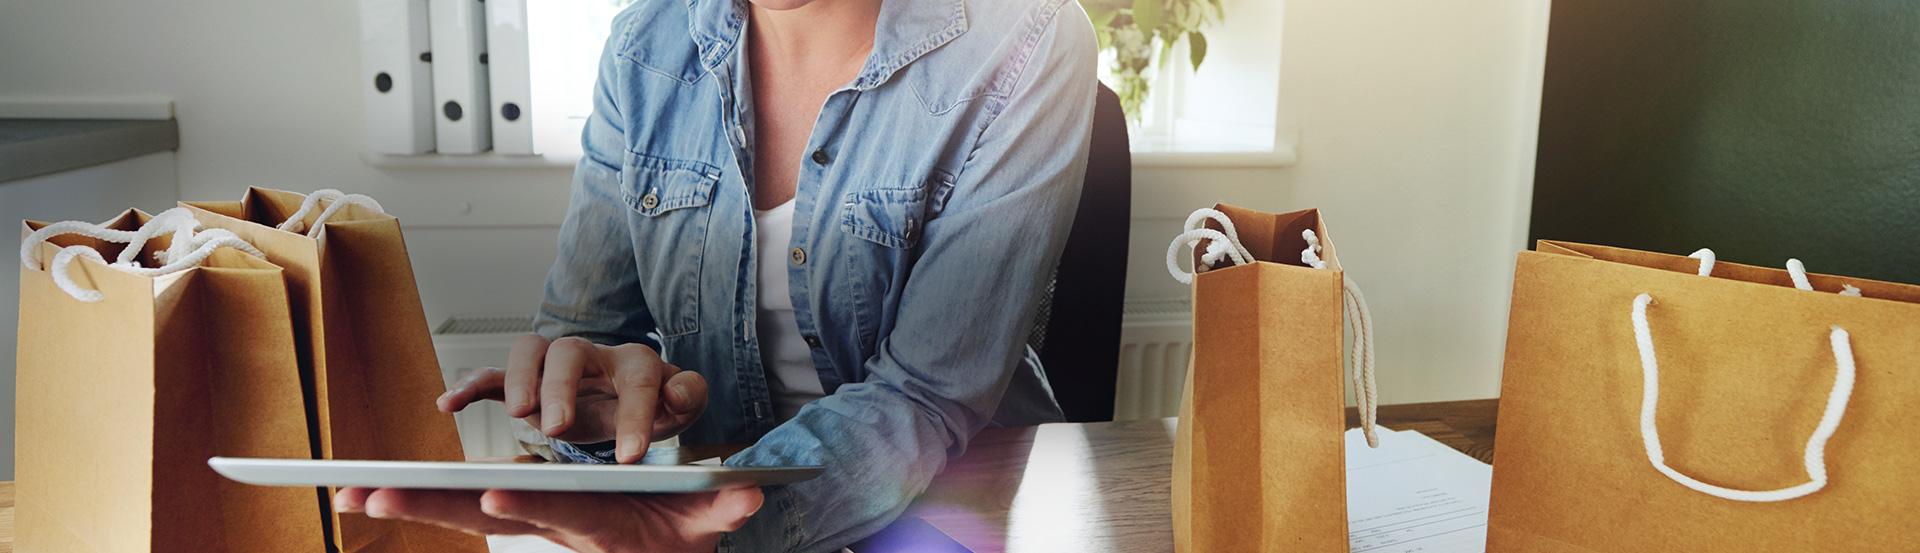 Optimisation e-Commerce : feedback sur site web